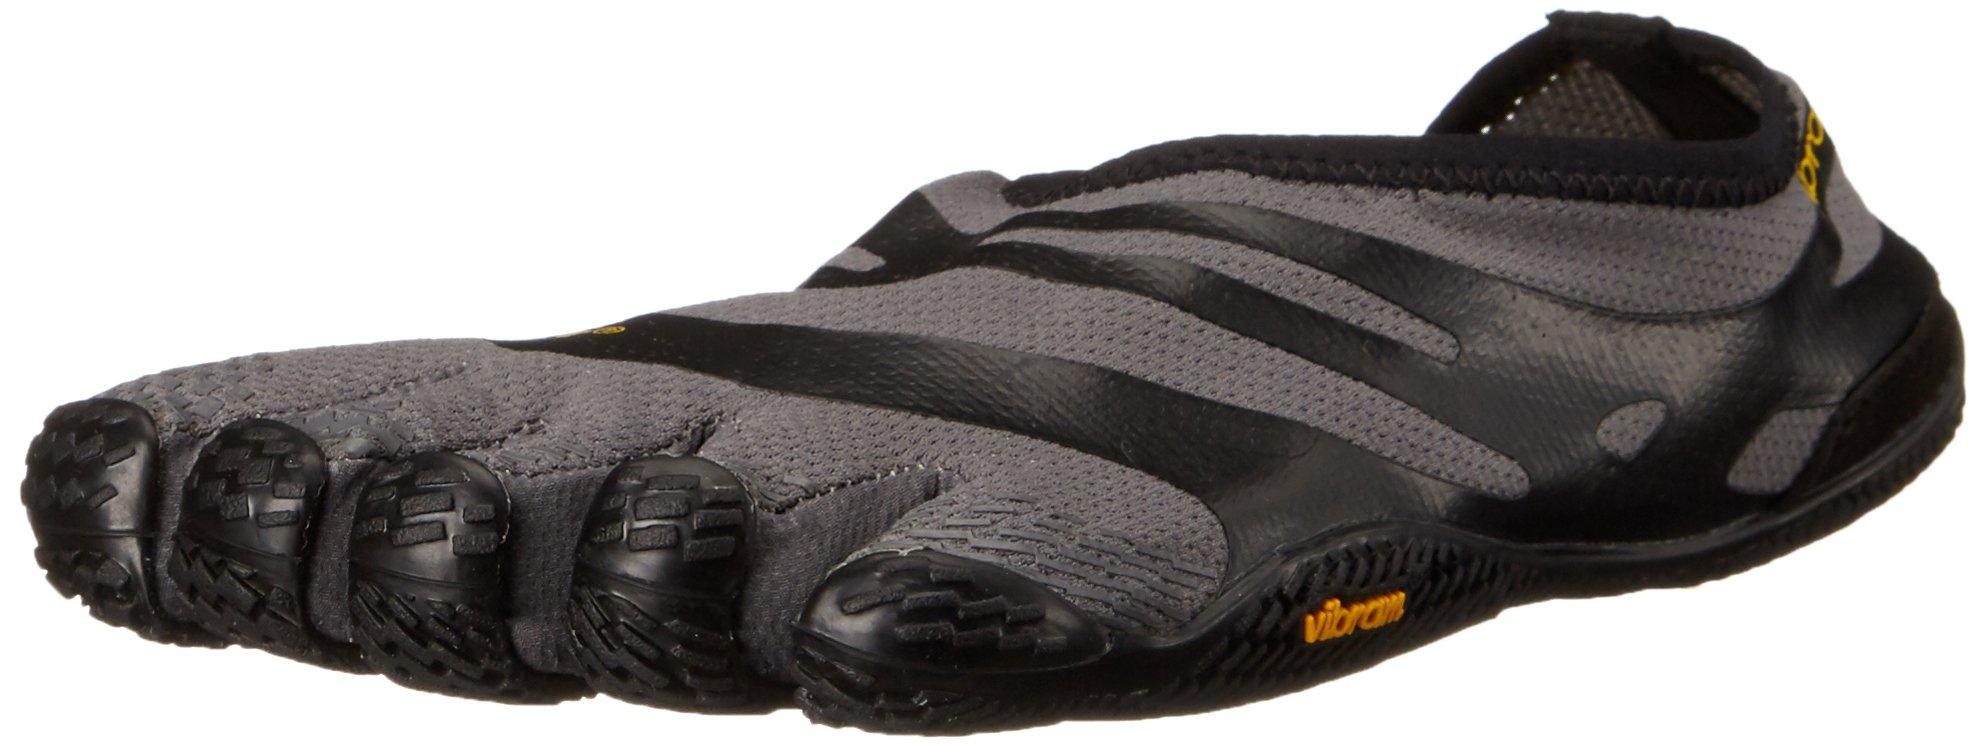 Vibram Men's EL-X Cross Training Shoe, Grey/Black, 44 EU/10.5-11 M US